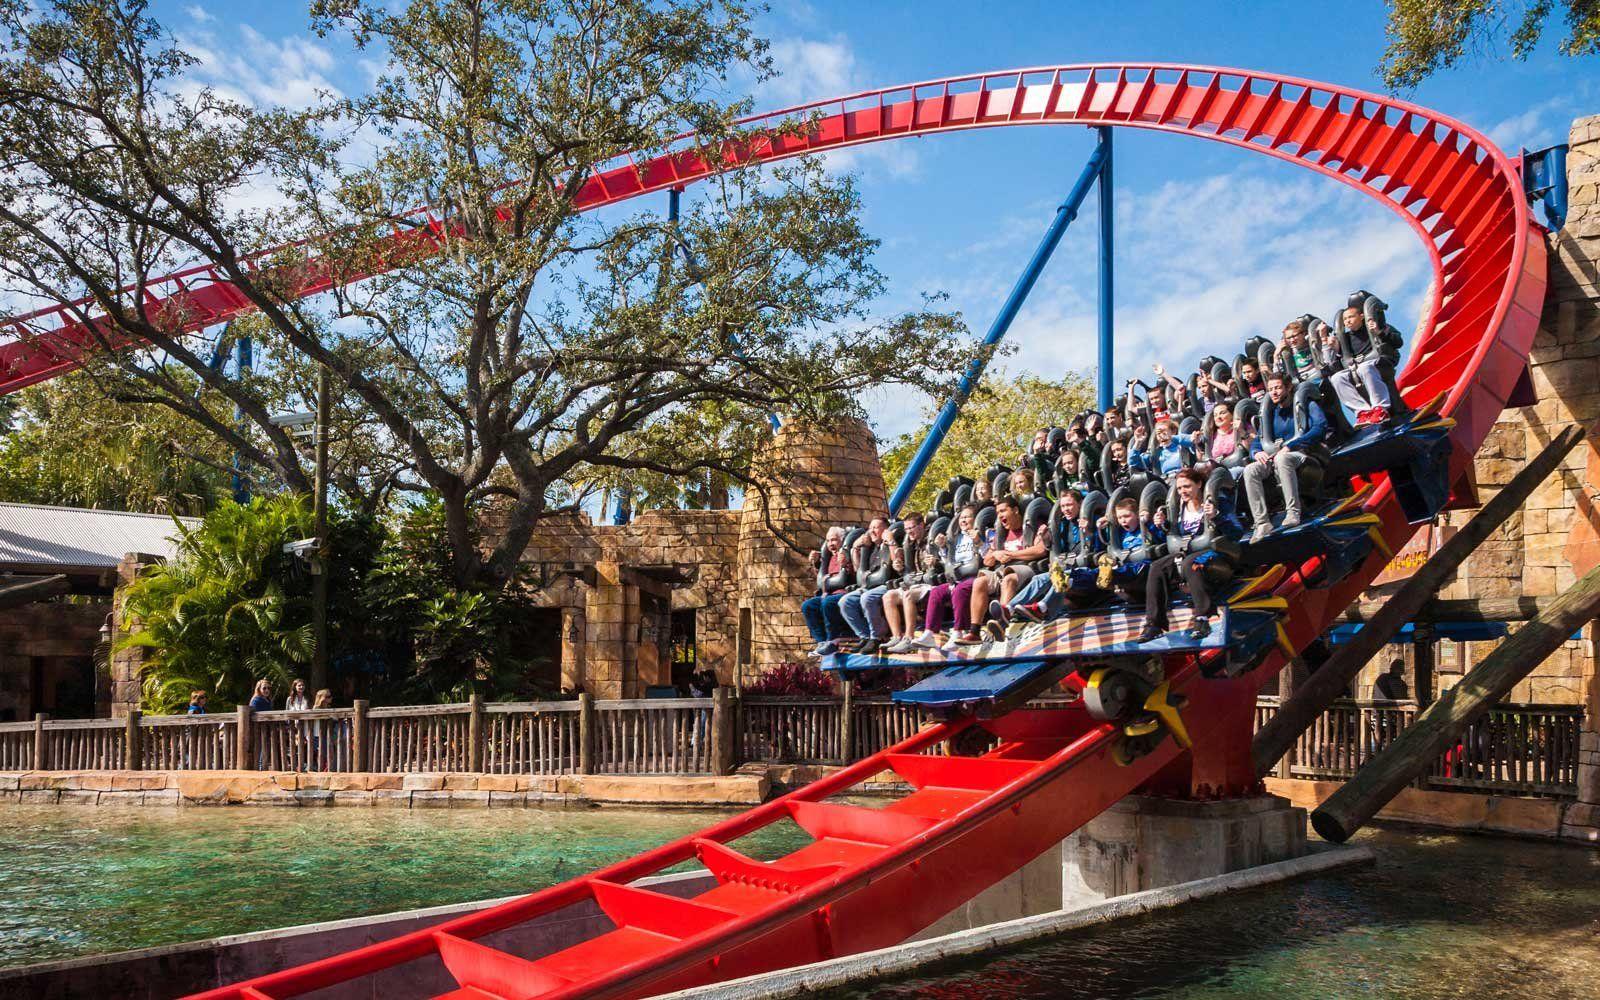 b6919cf1ce60279ecbd92f278c47d618 - How Crowded Is Busch Gardens Tampa